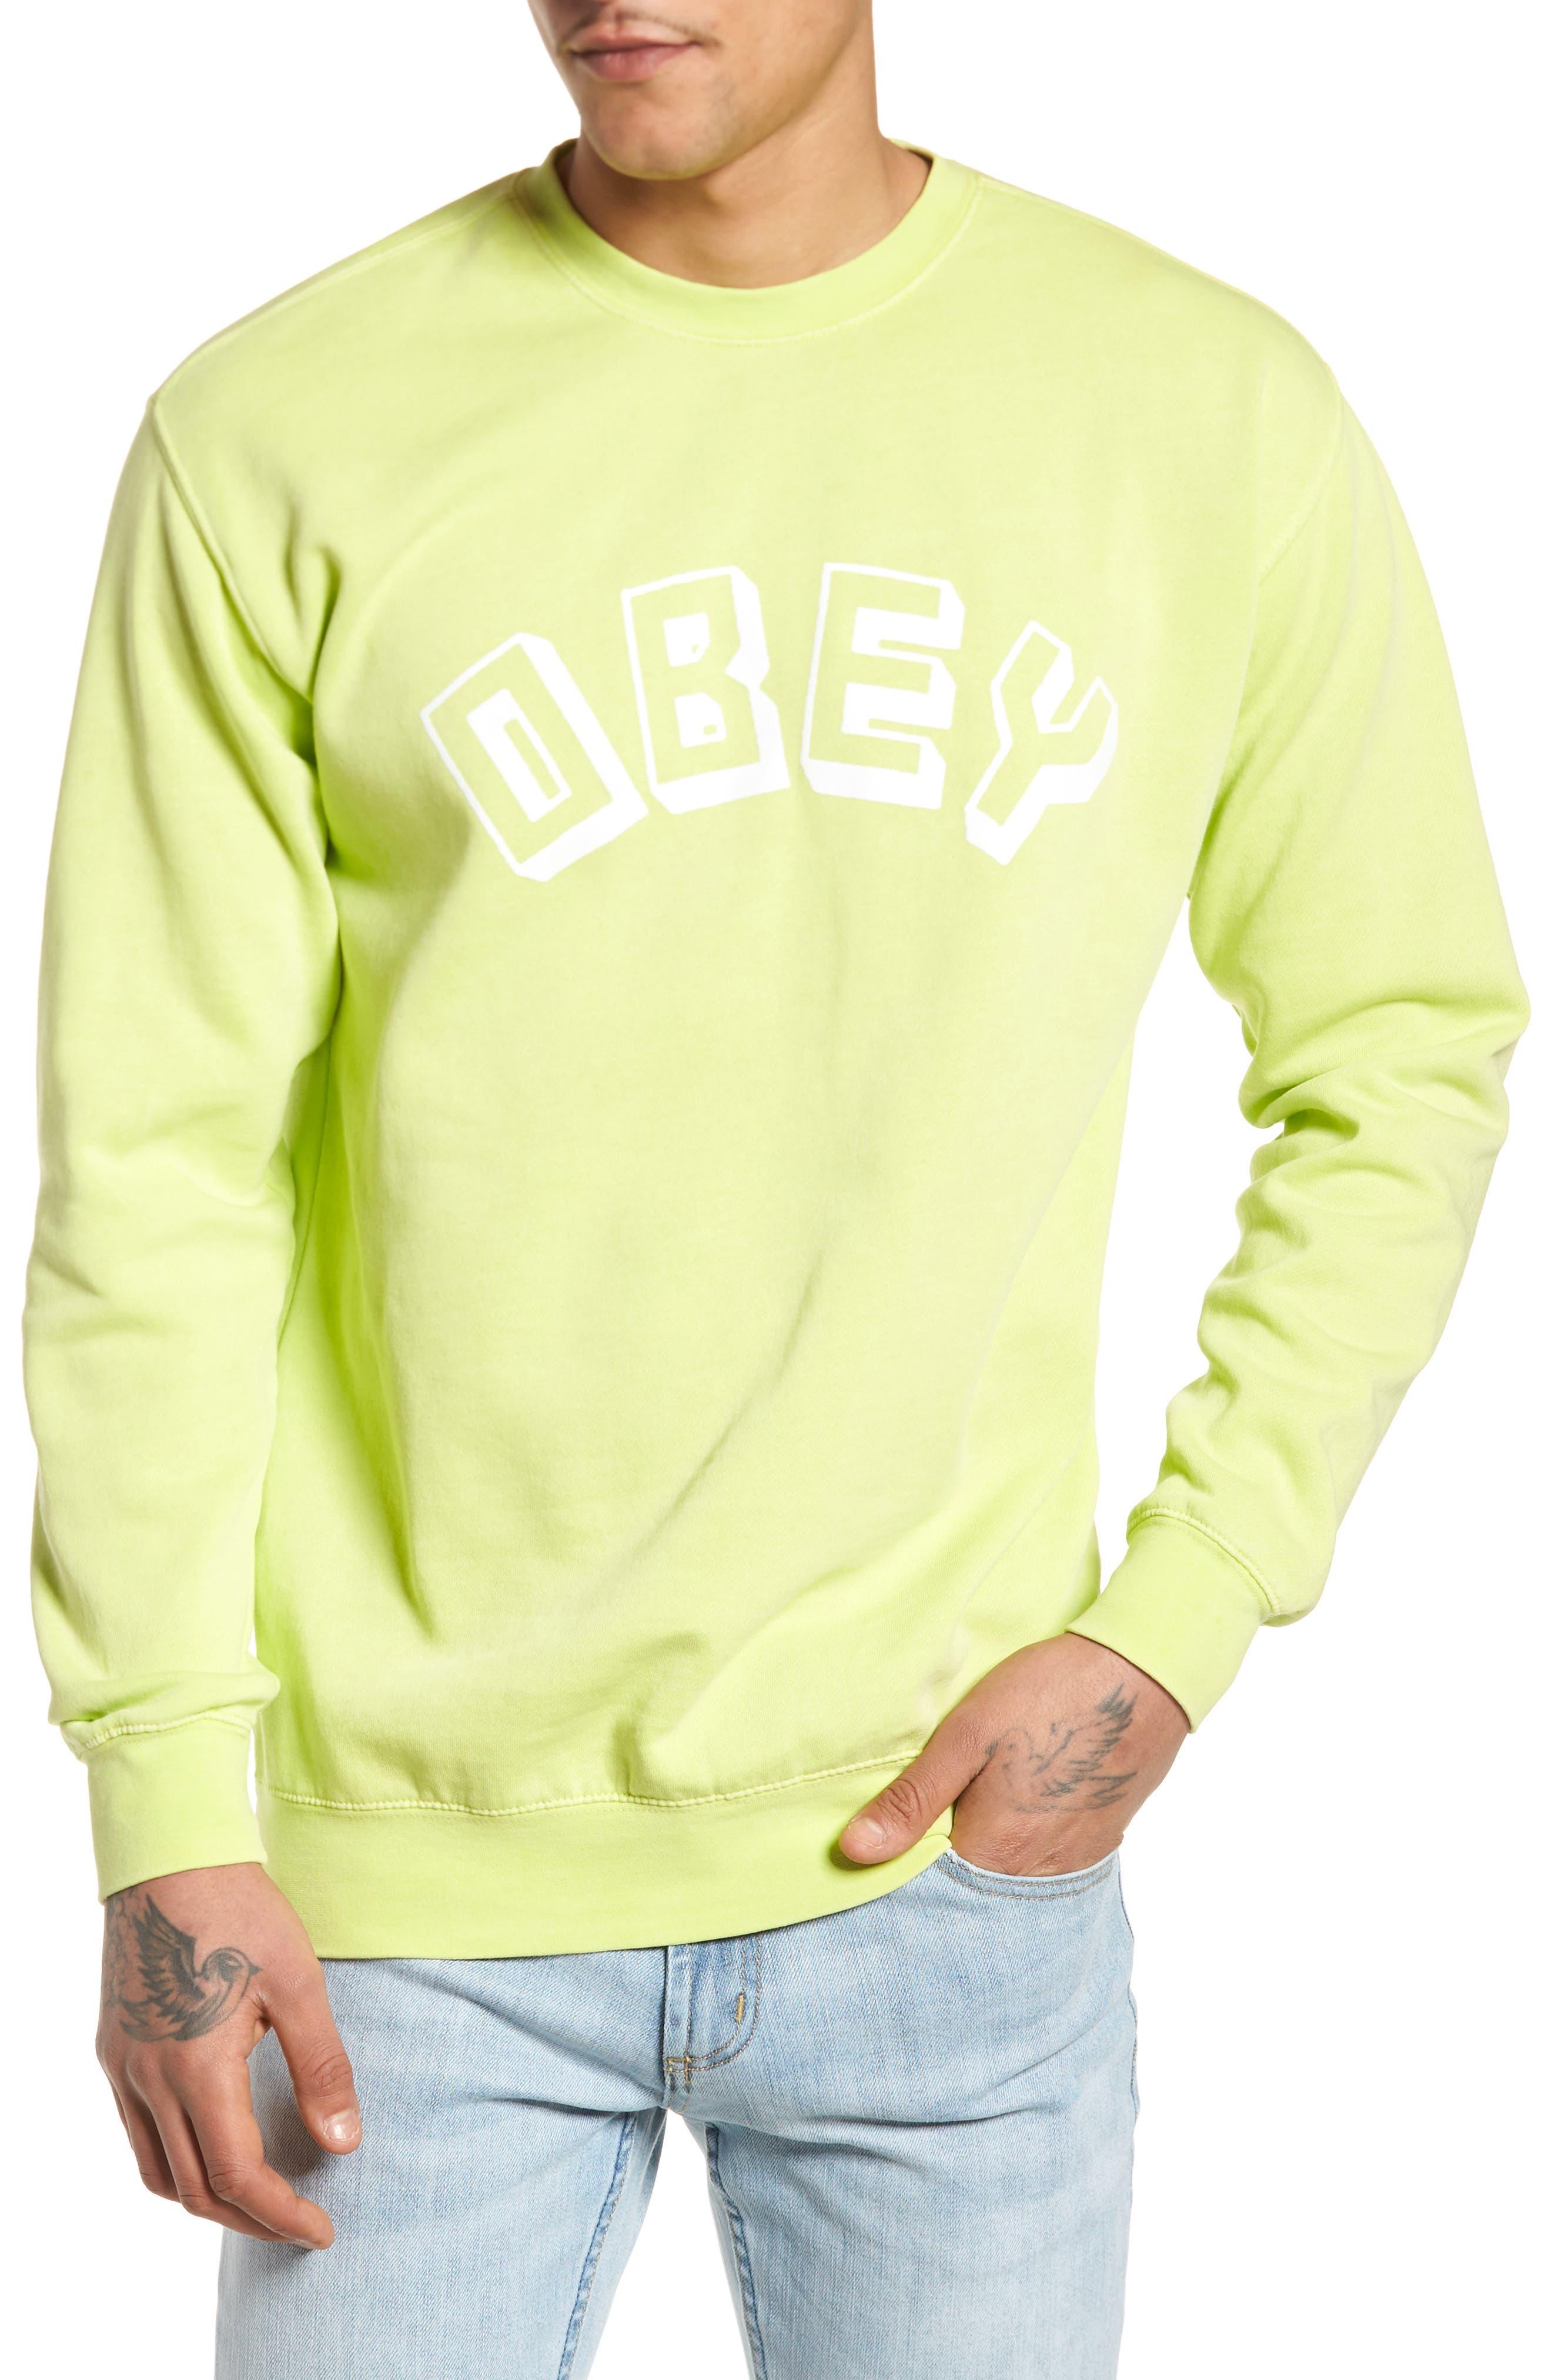 New World Sweatshirt,                         Main,                         color, Dusty Mint